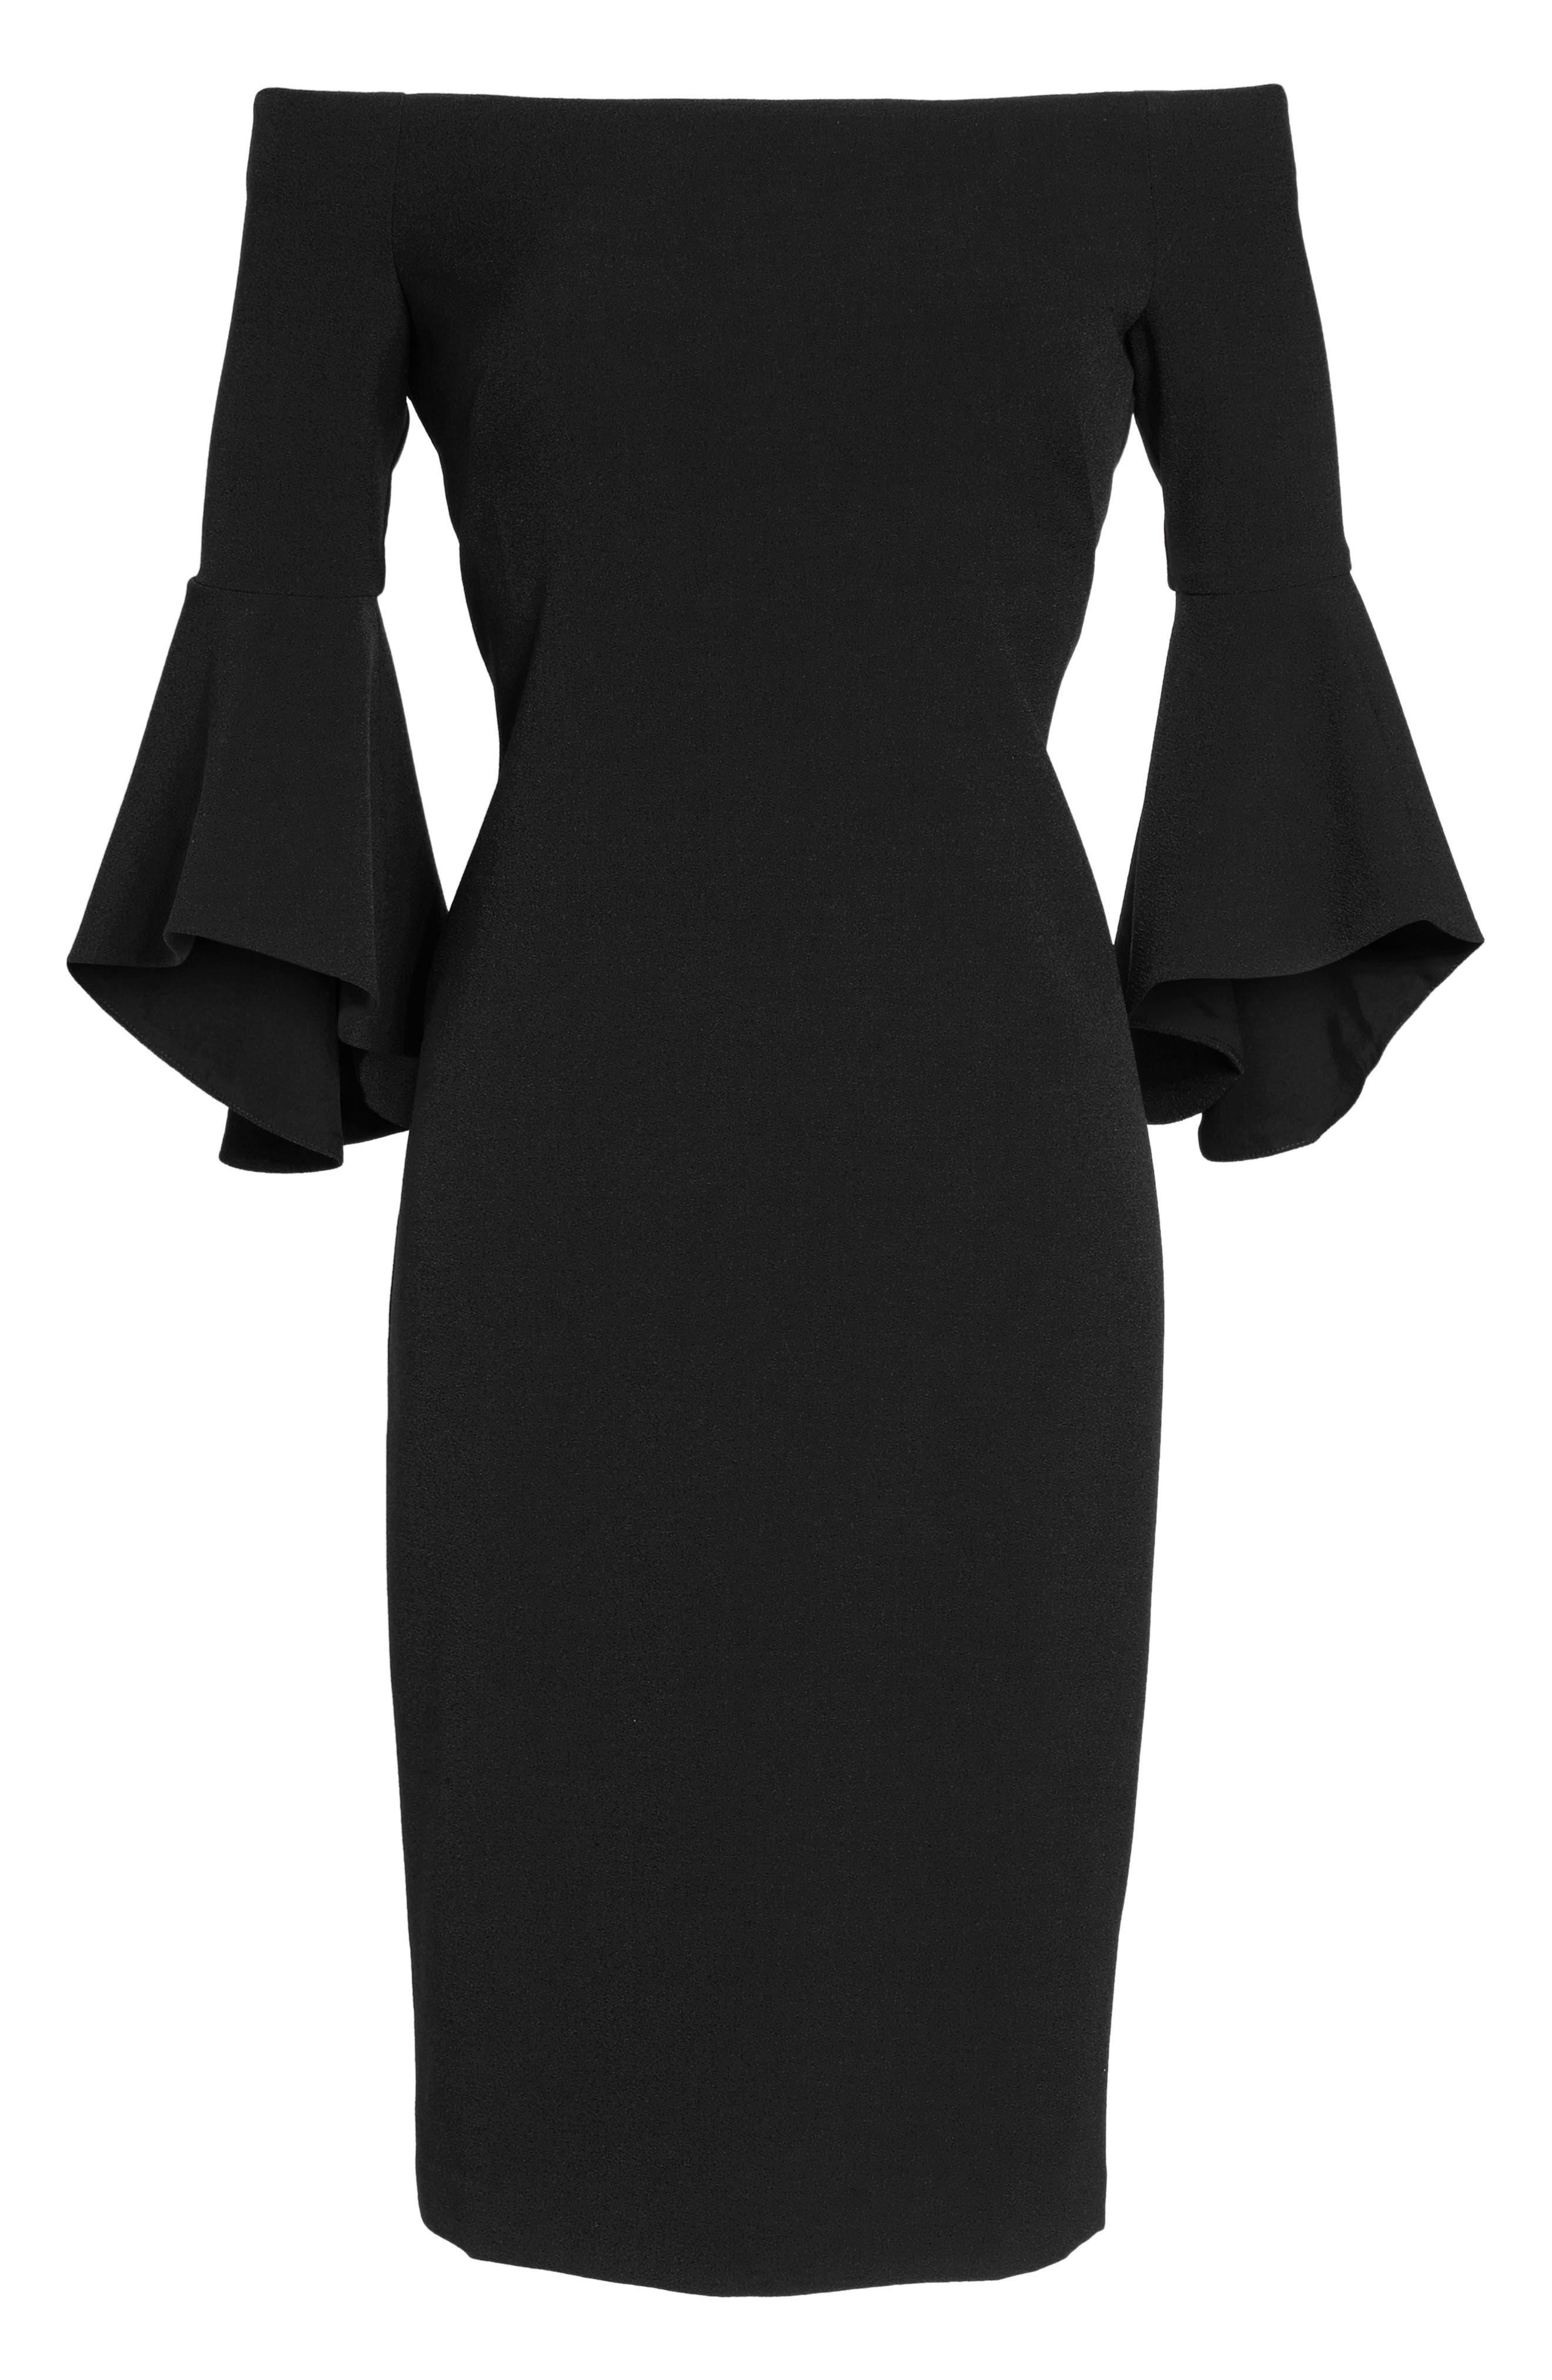 Petite Chelsea28 Off The Shoulder Cocktail Dress, Black